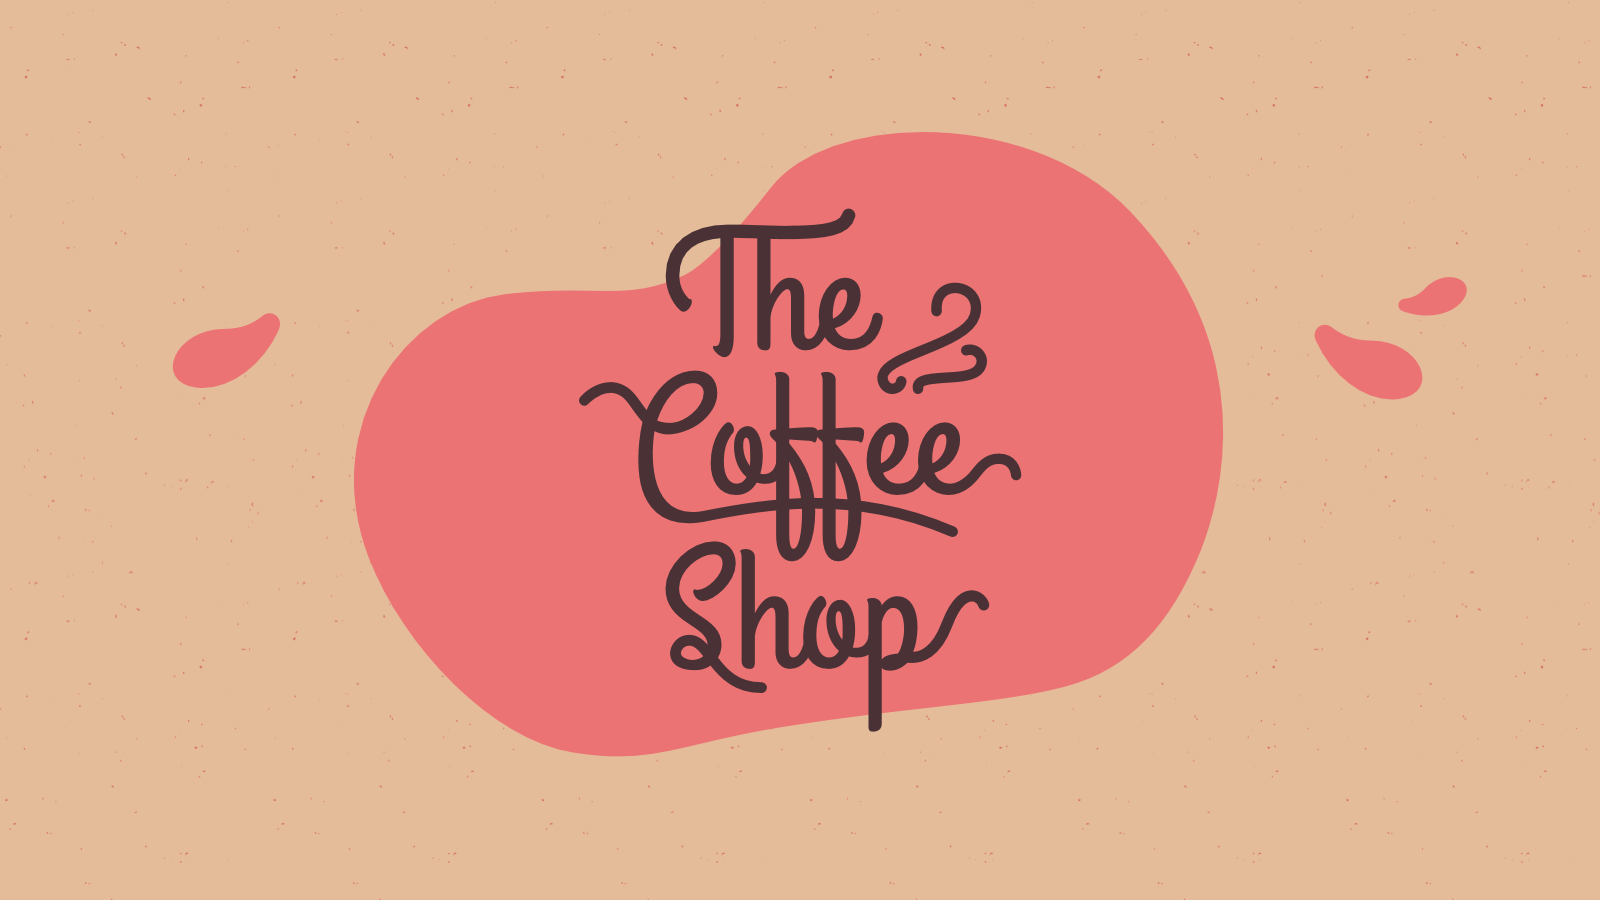 Plantilla de presentación Branding para cadena de cafeterías